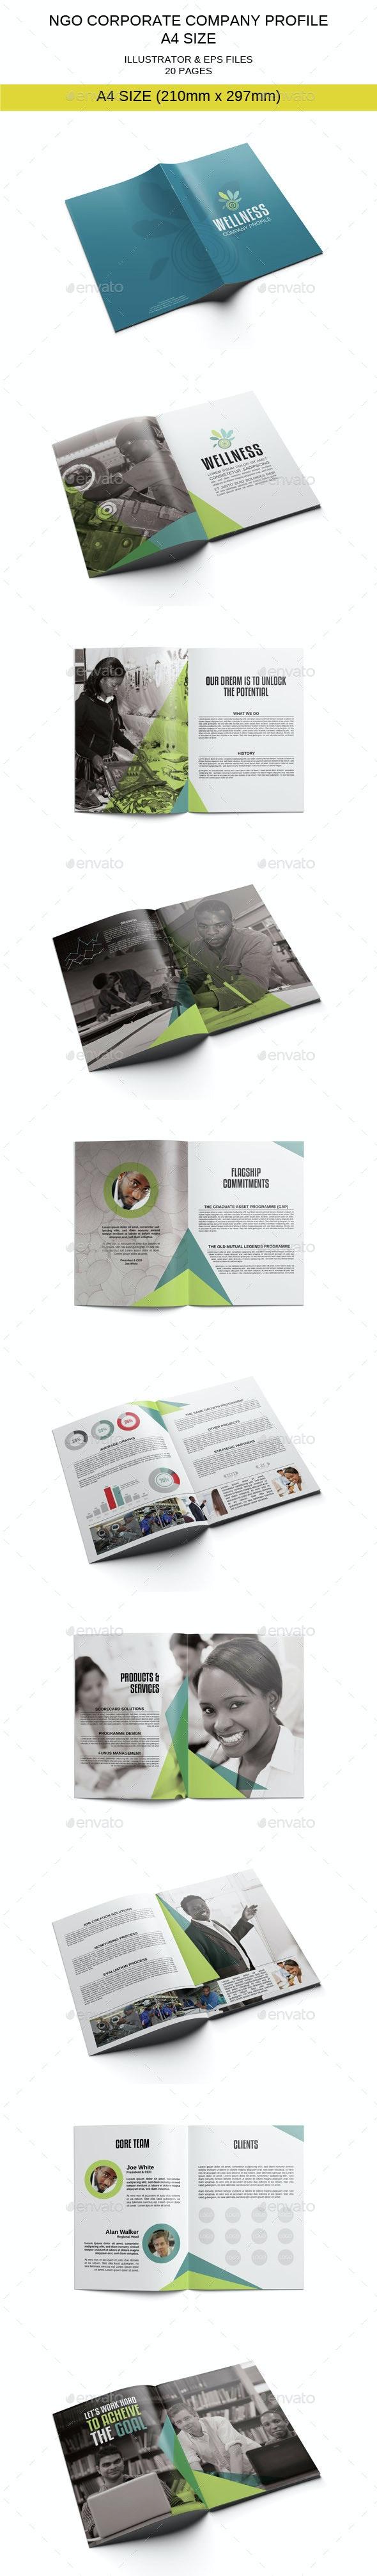 NGO Corporate Company Profile Template - Corporate Brochures